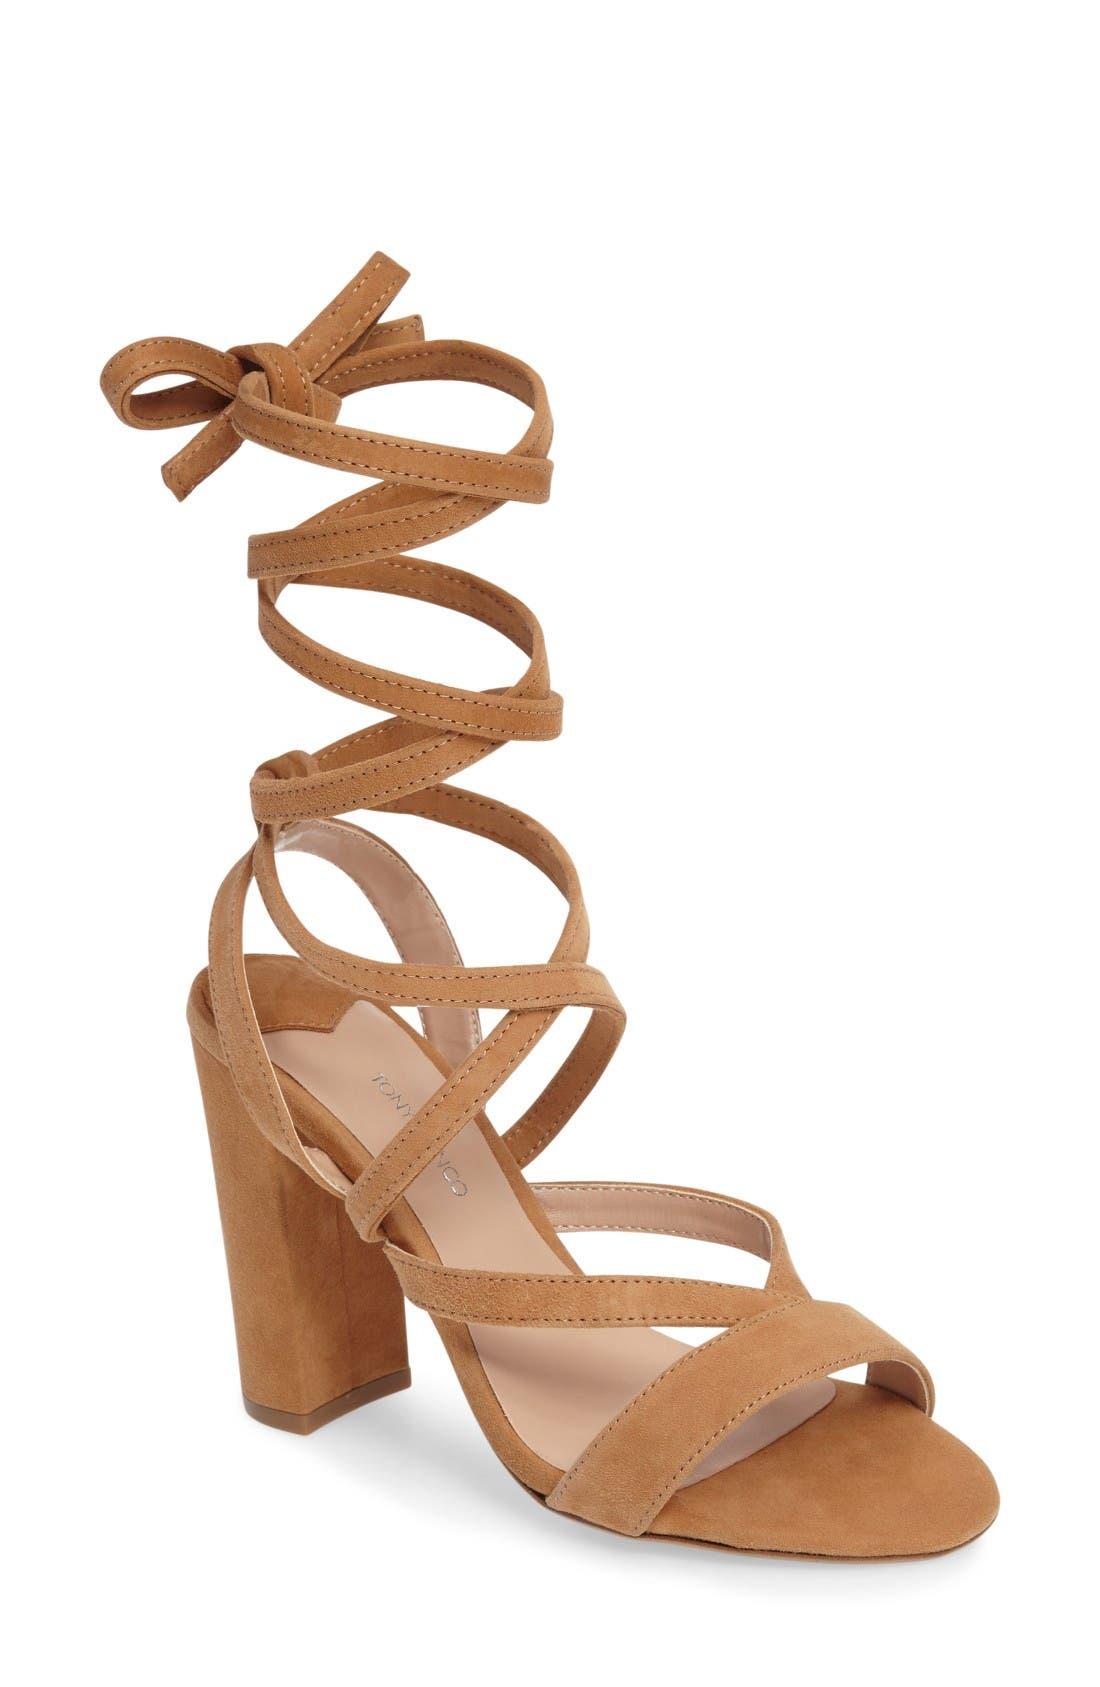 Main Image - Tony Bianco Kappa Ankle Wrap Sandal (Women)